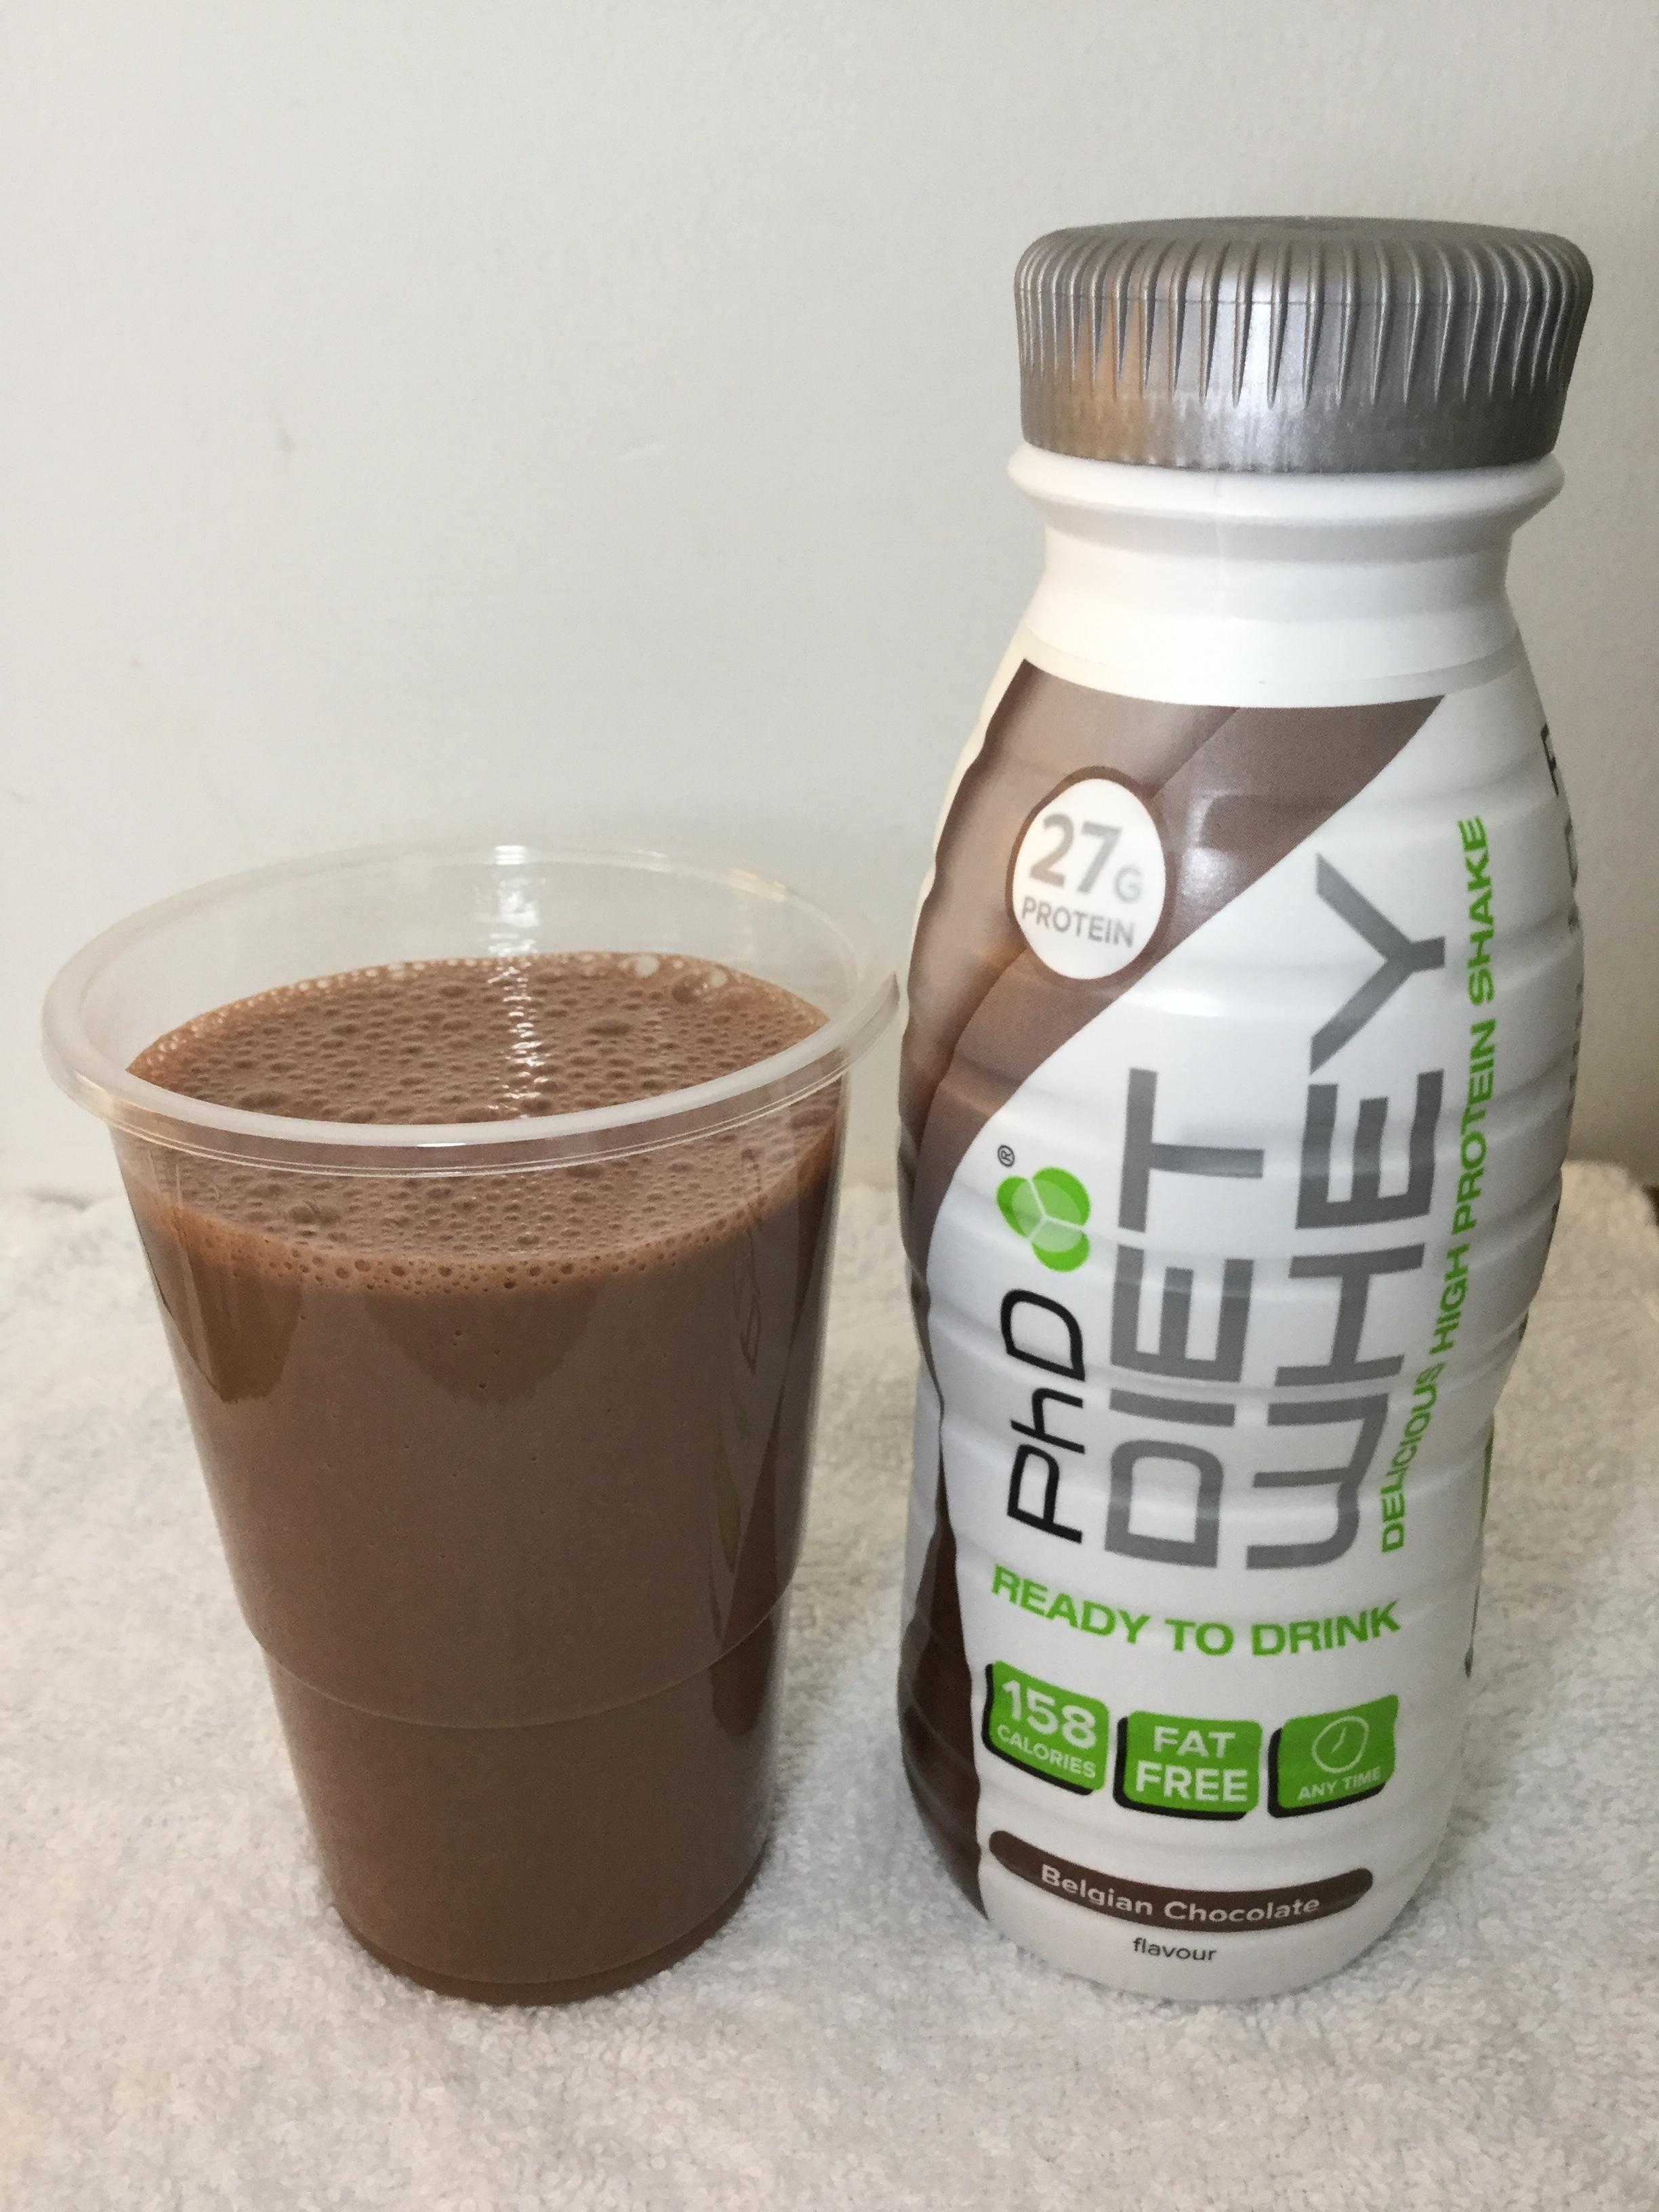 PhD Diet Whey Belgian Chocolate Cup